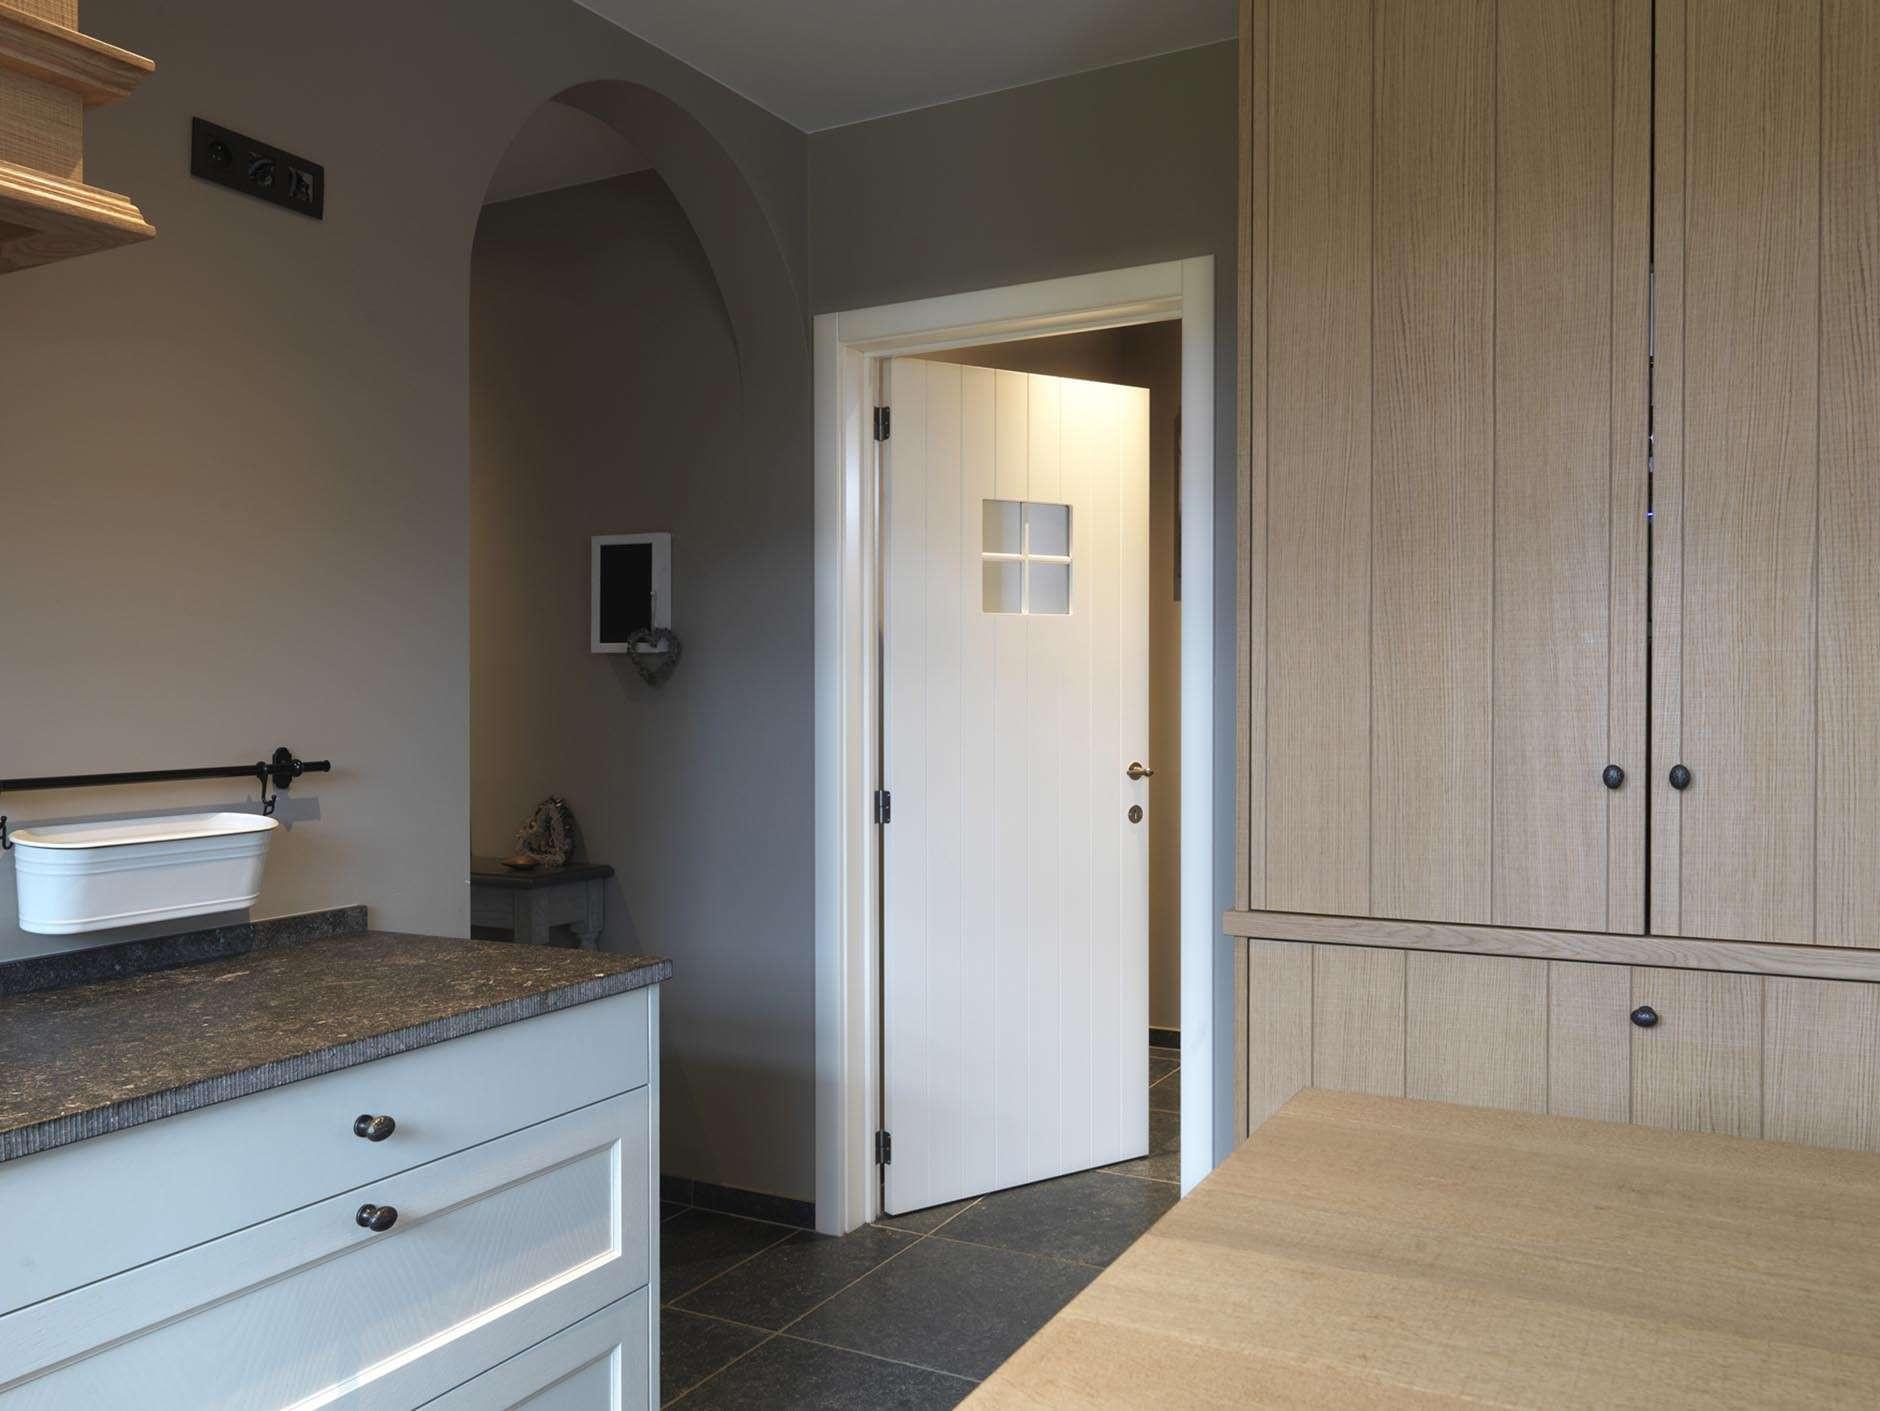 landelijke-keuken-wit-gelakte-binnendeur